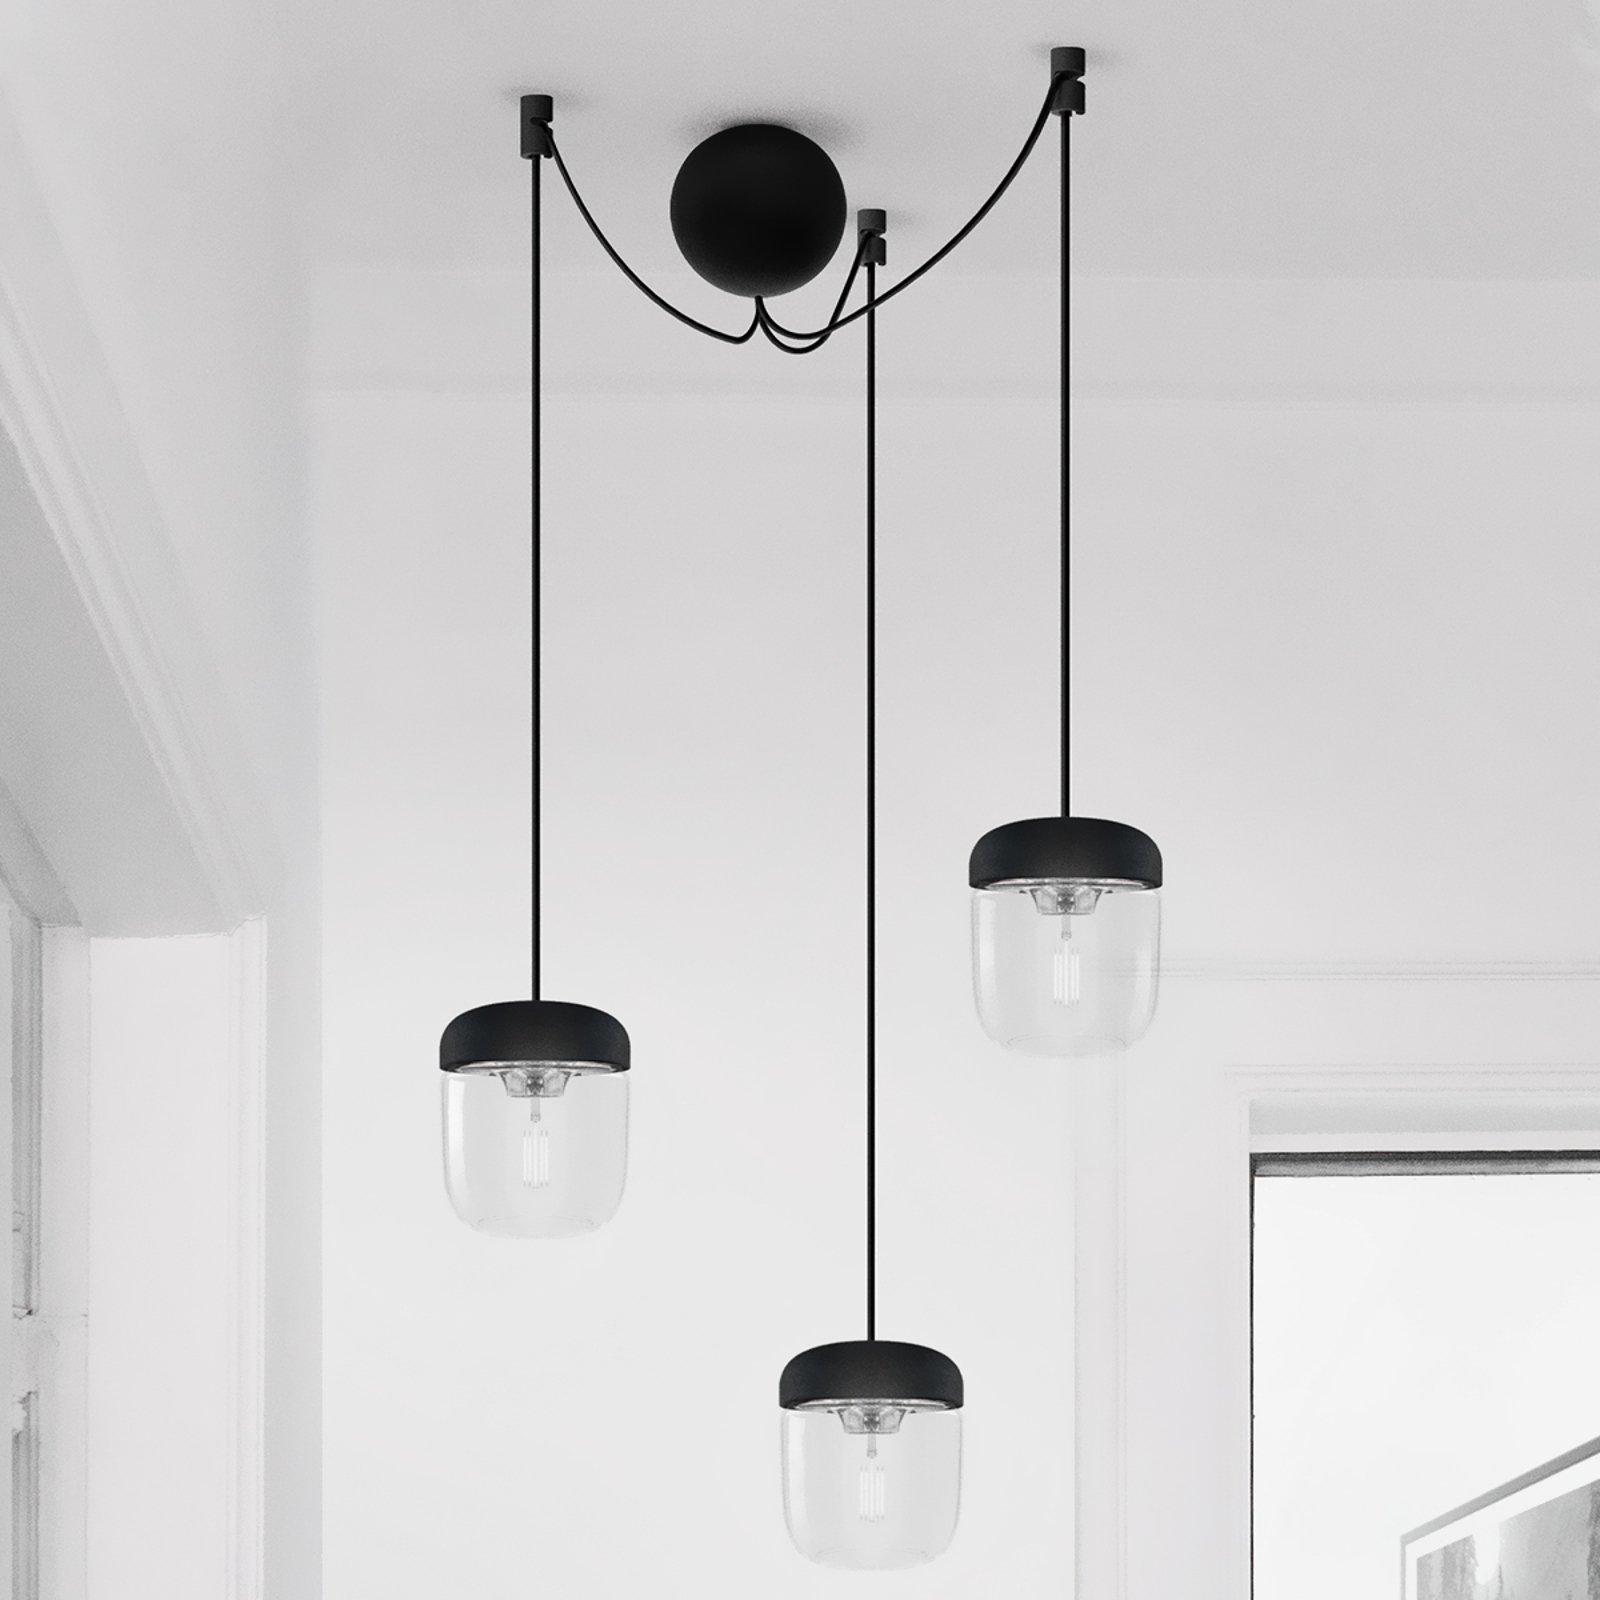 Pendellampe Acorn, svart og stål, 3 lyskilder